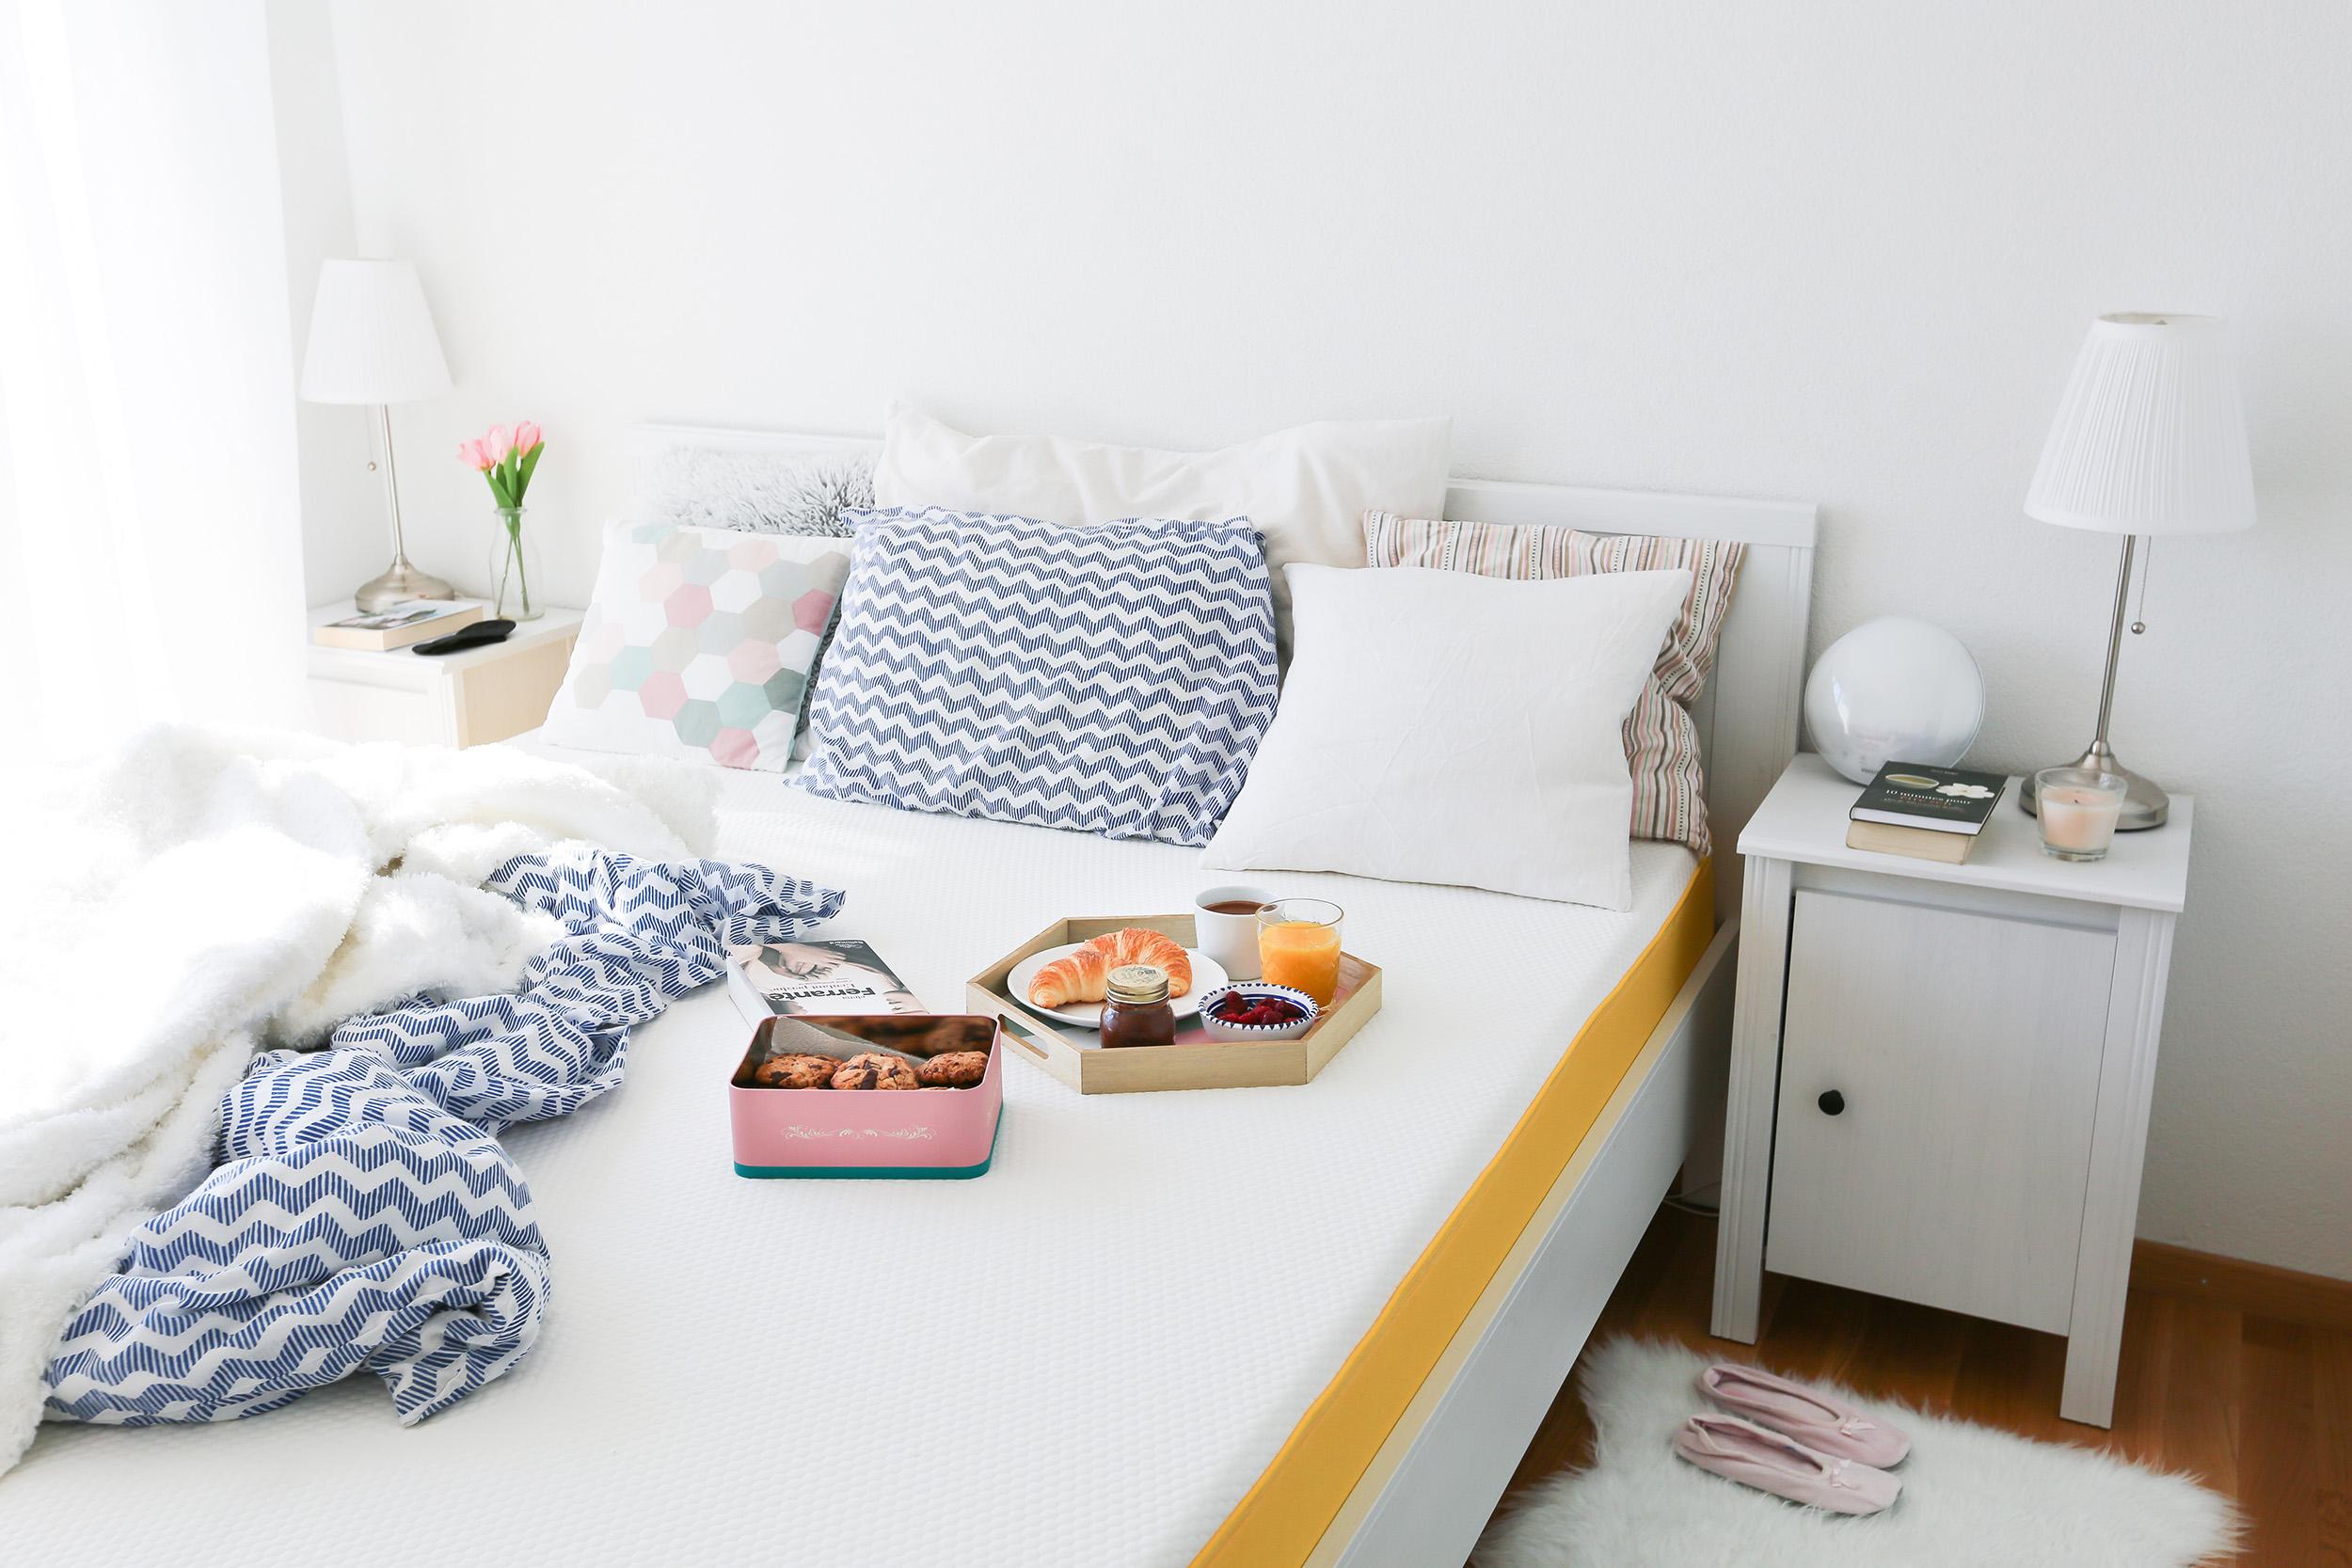 l importance de bien dormir de belles nuits avec le. Black Bedroom Furniture Sets. Home Design Ideas